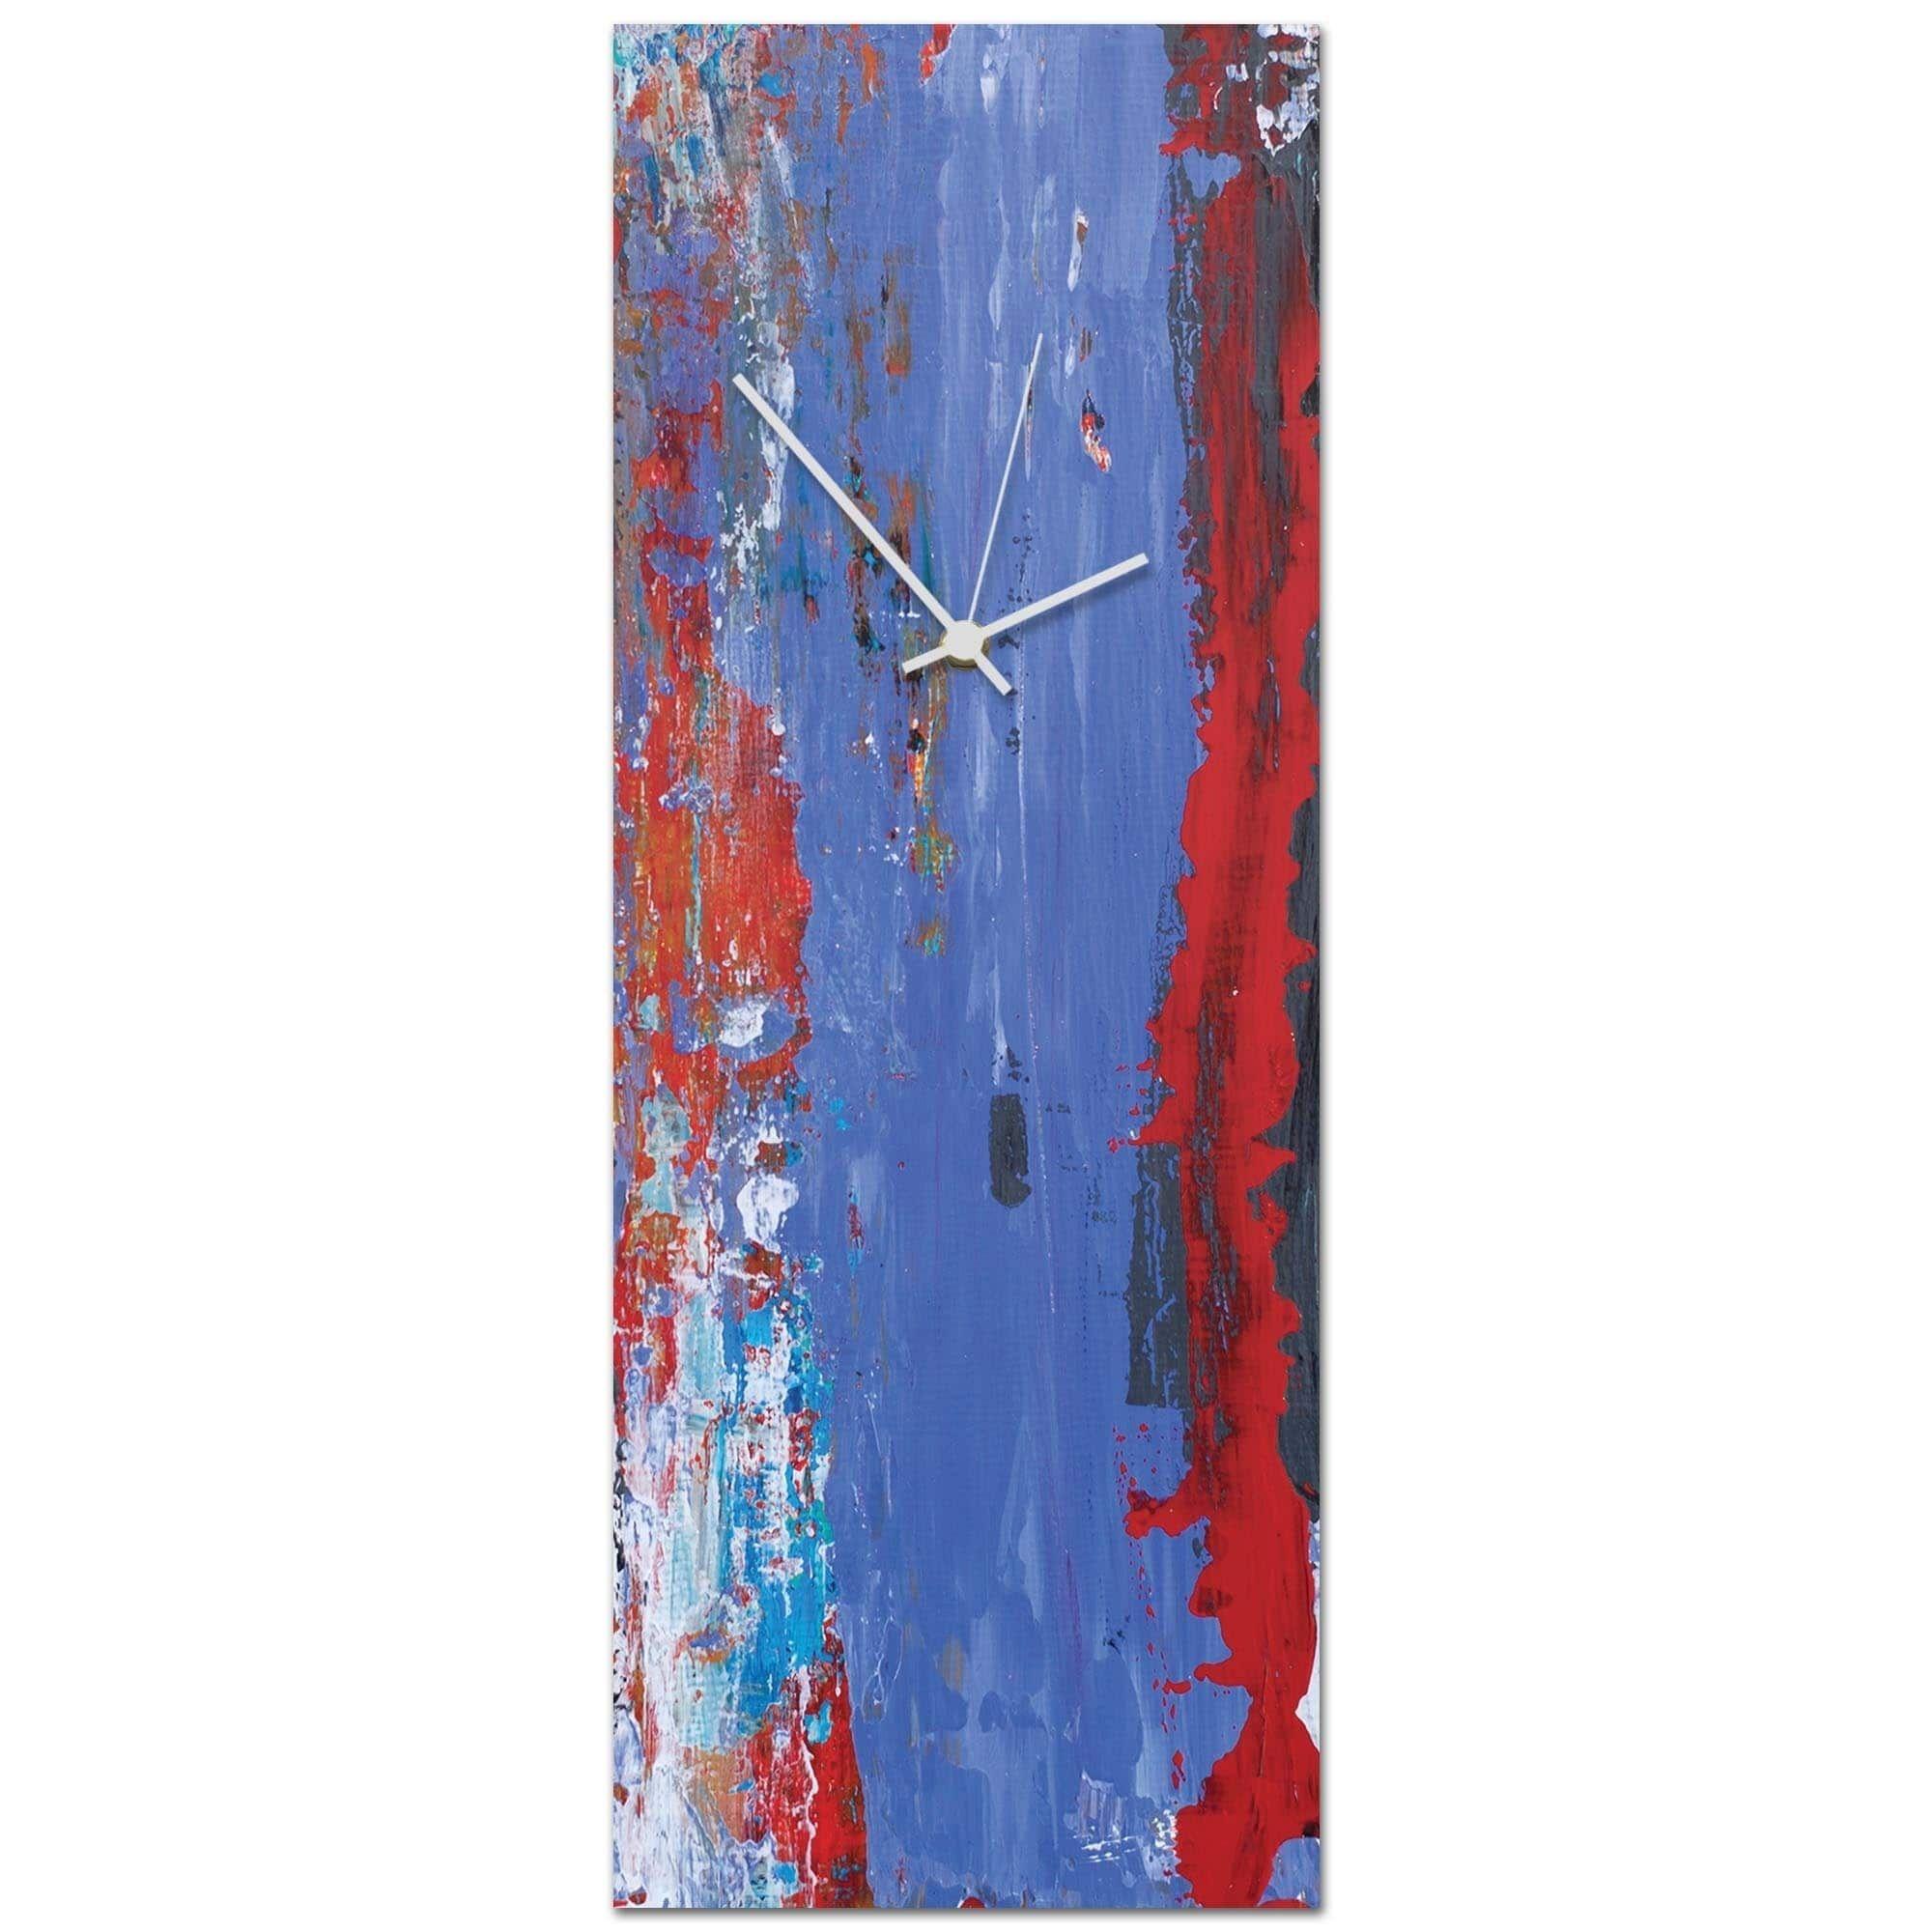 Celeste reiter uurban cool v clock largeu in x in modern wall